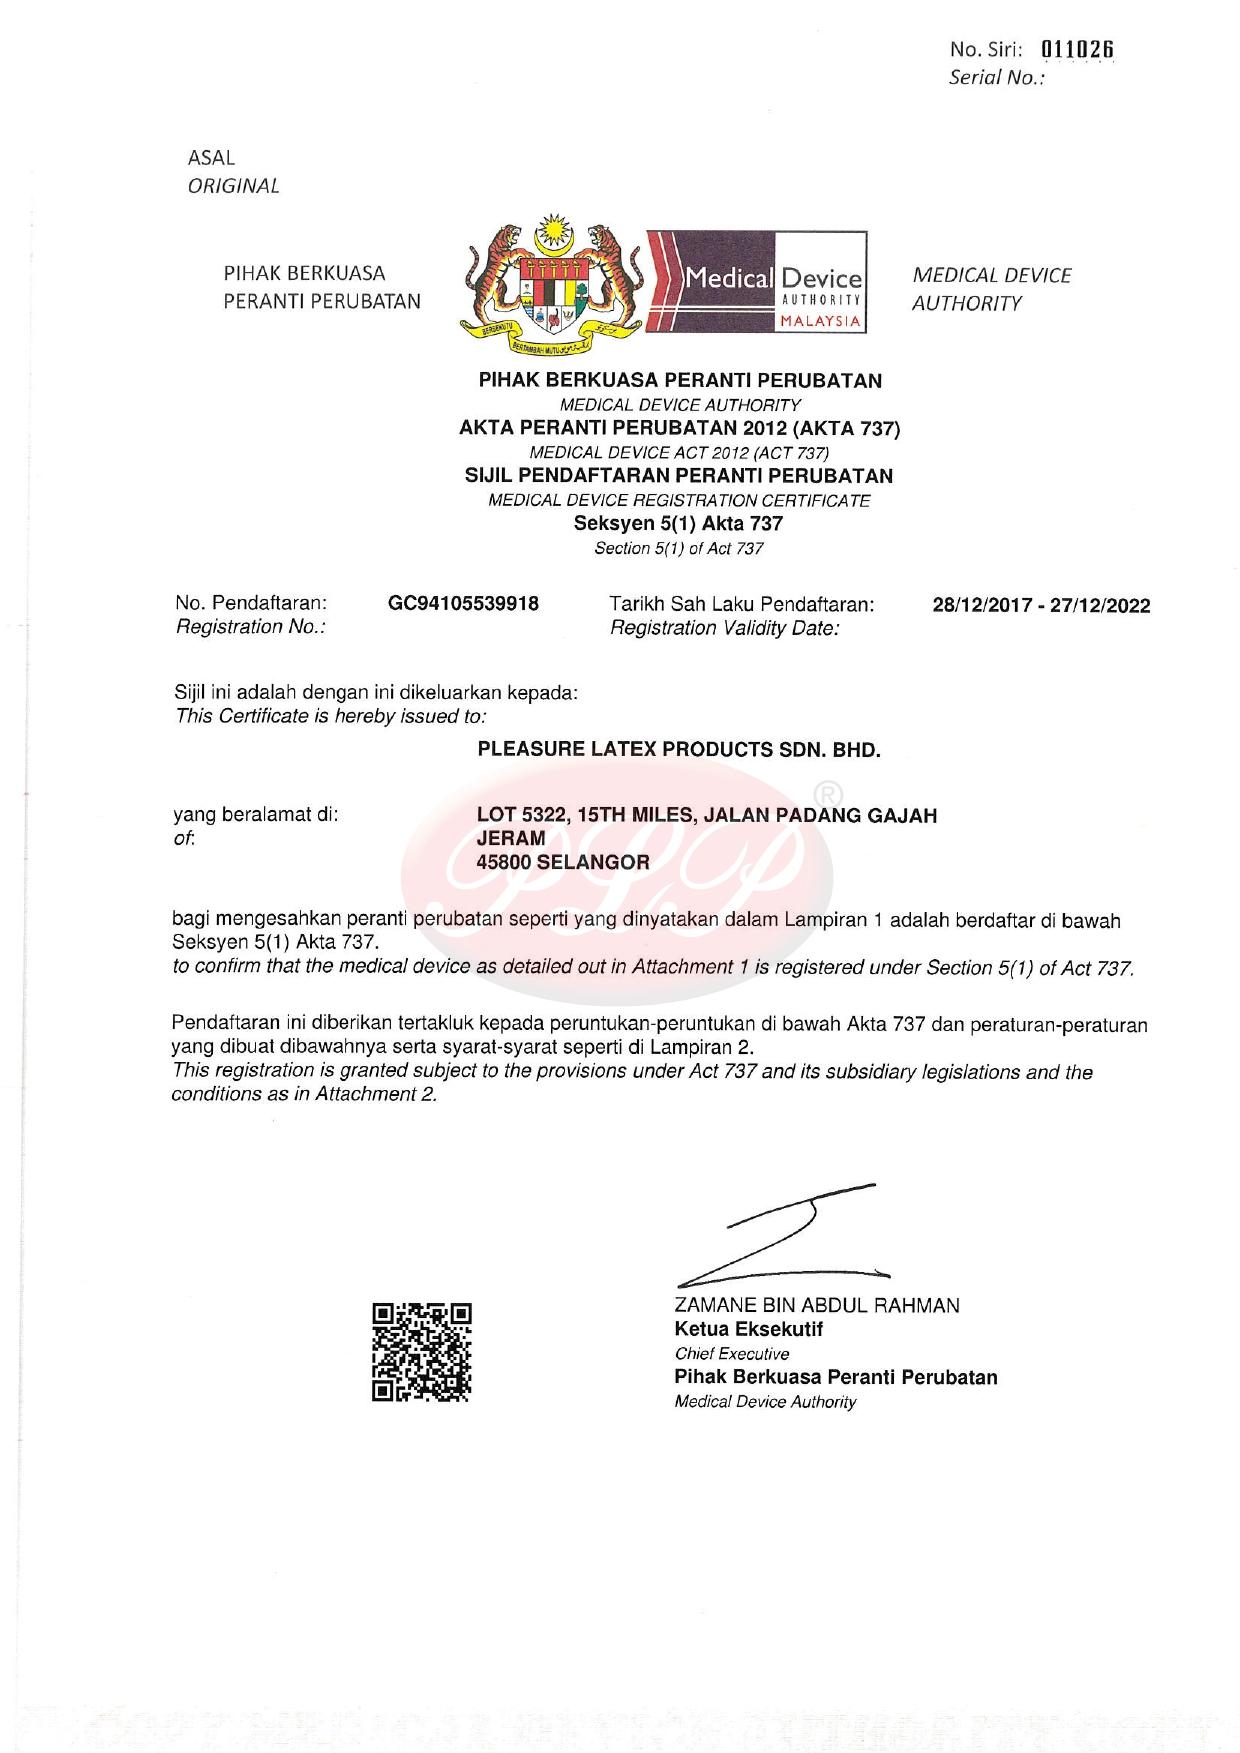 Malaysia MDA Registration Certificate - VIP Brand